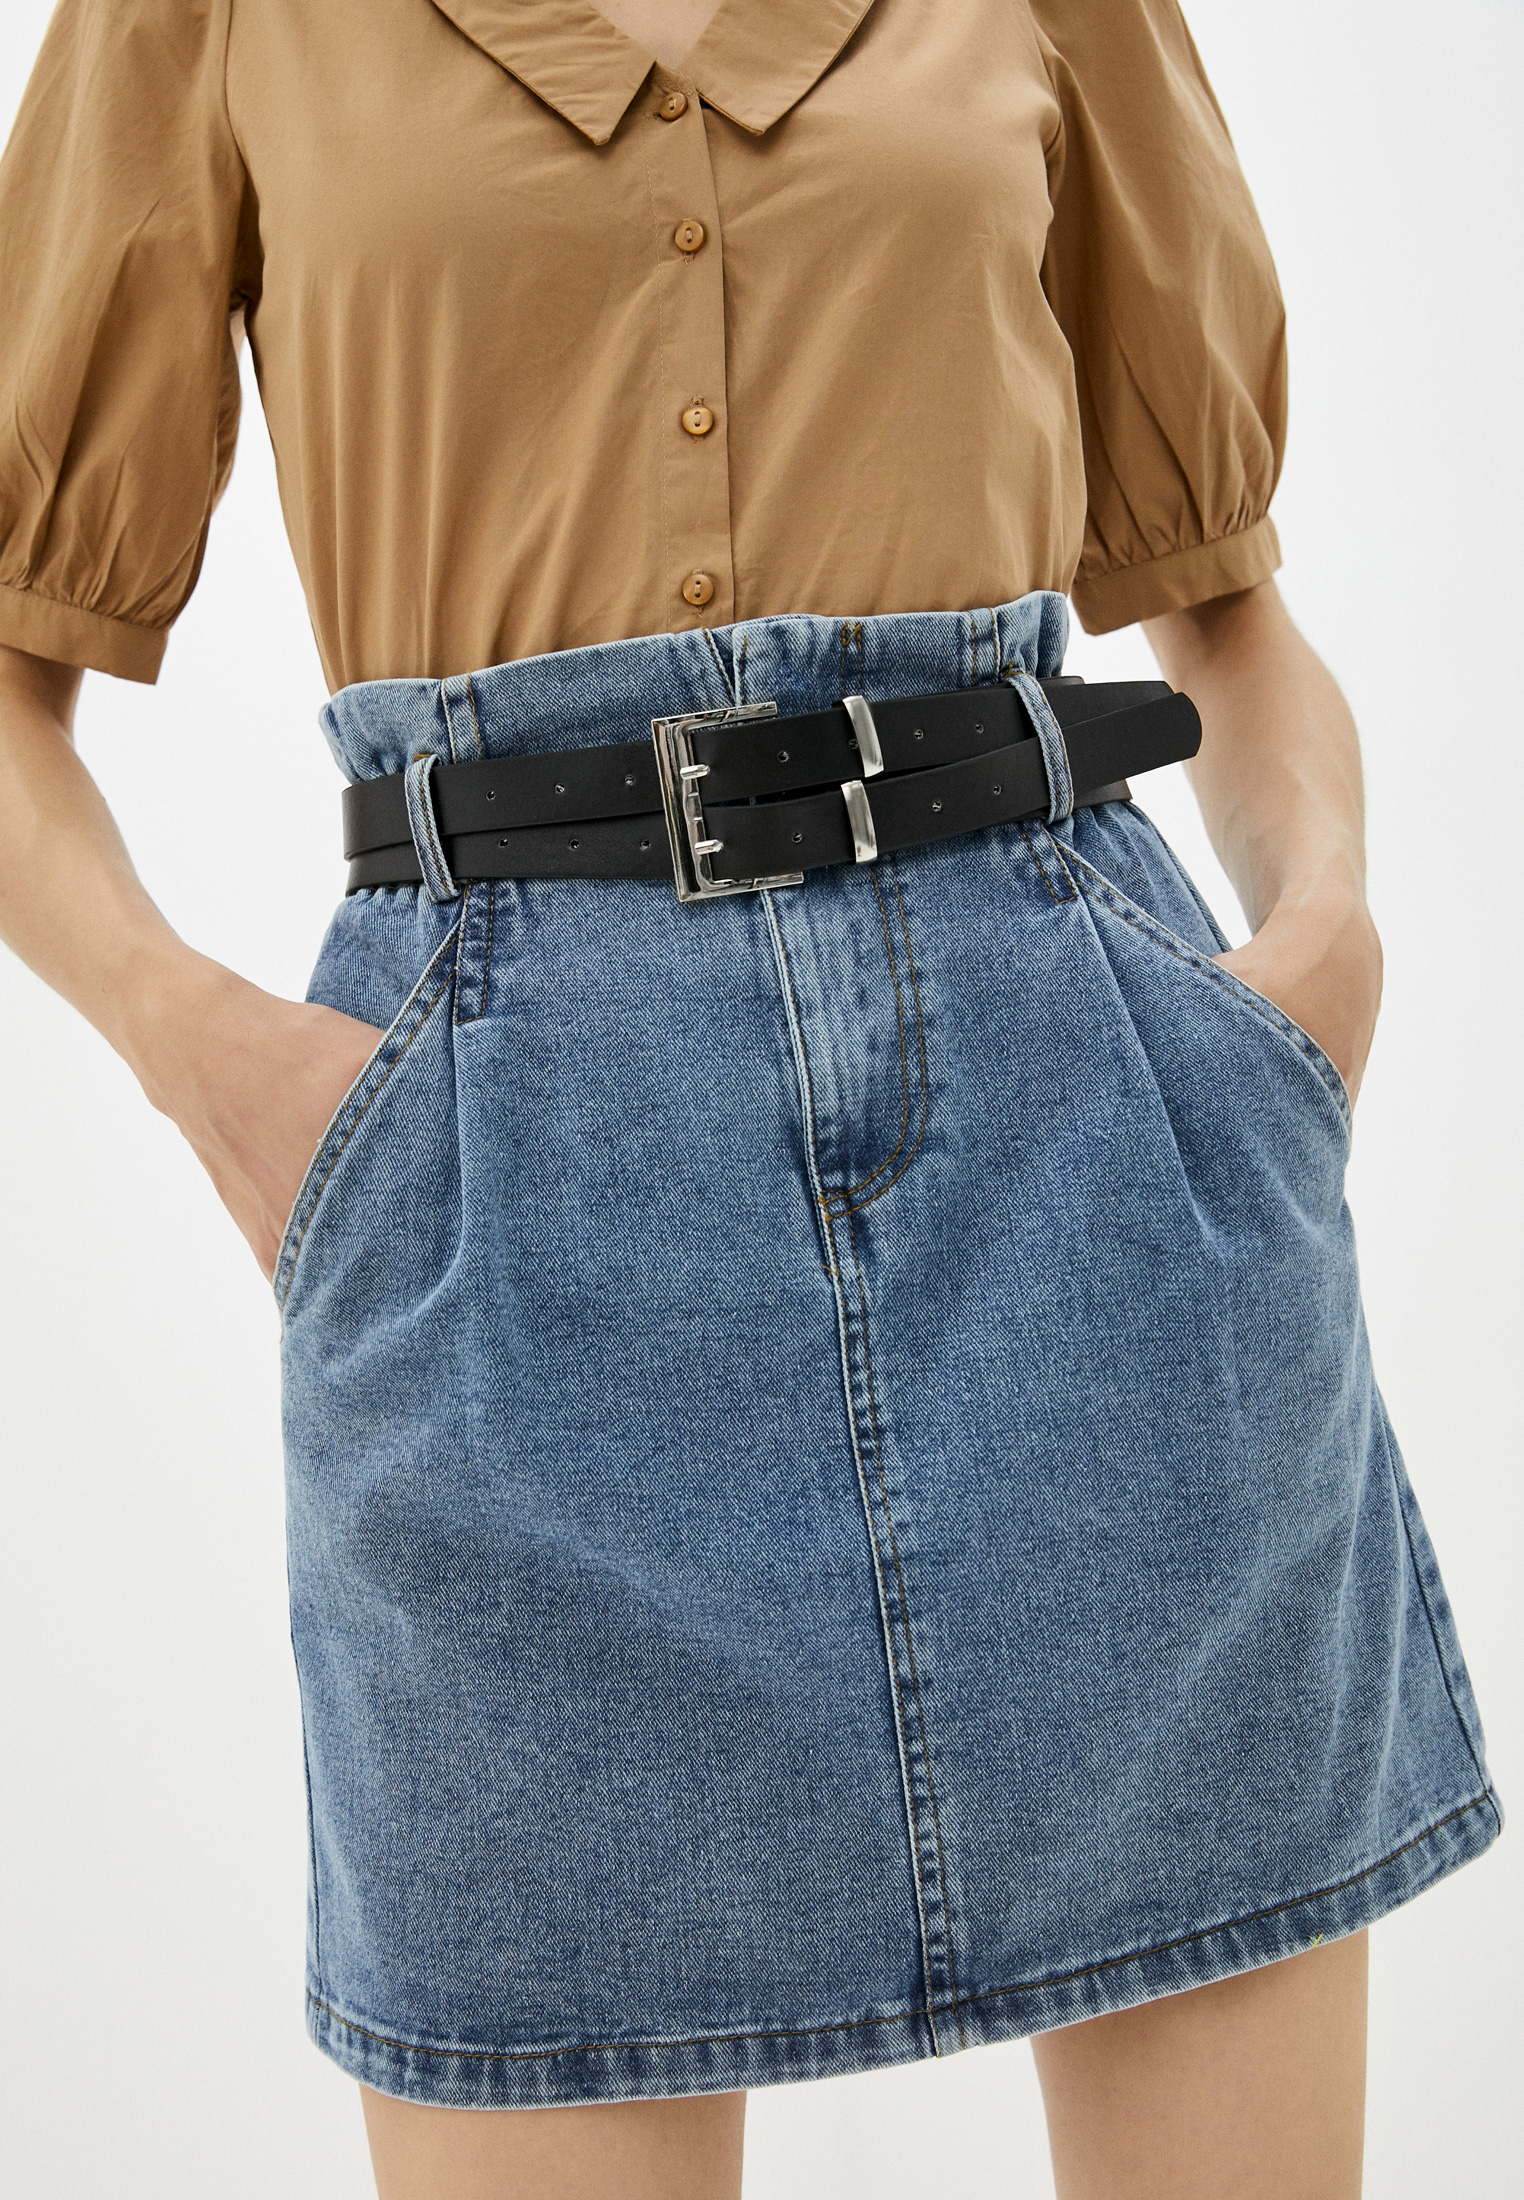 Джинсовая юбка Miss Gabby Юбка джинсовая Miss Gabby